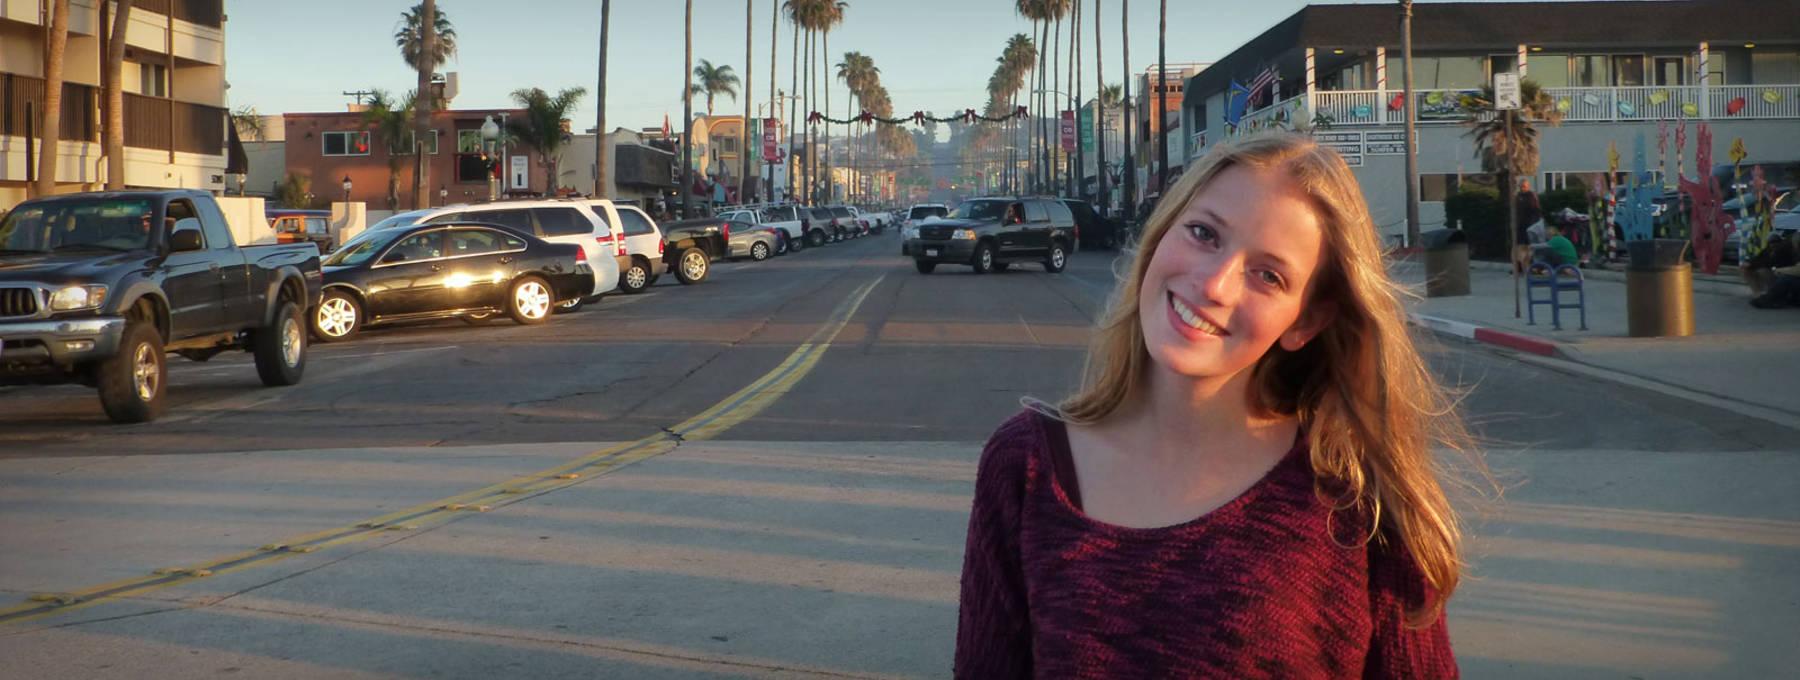 Kleidung an der amerikanischen High School | Travel-Tipp - Stepin